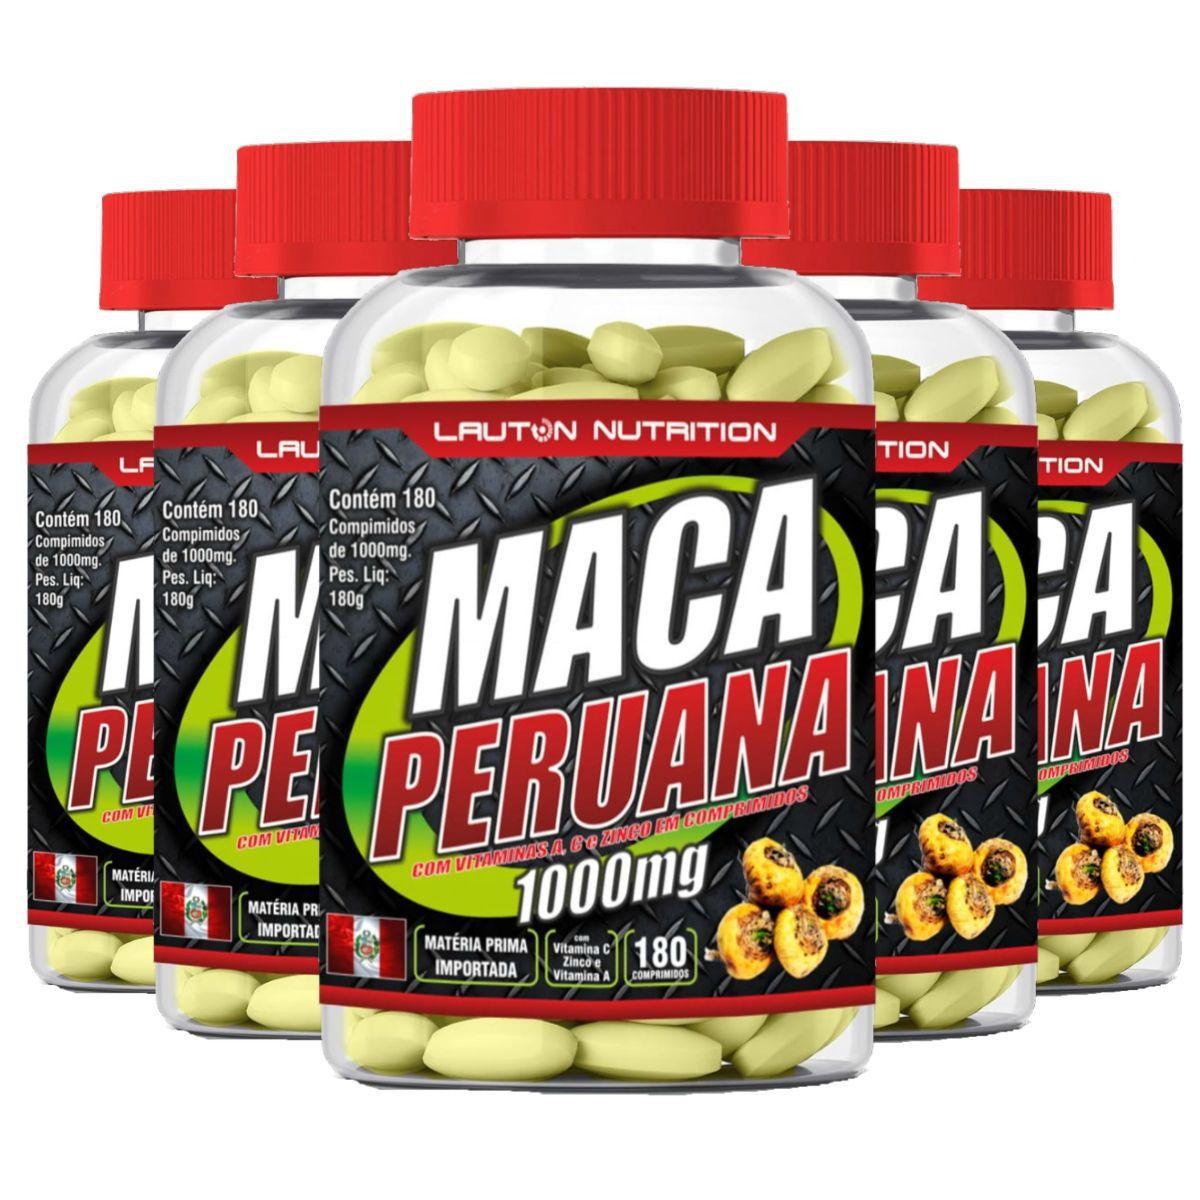 Kit 5 Maca Peruana 180 Tabs 1000mg - Lauton Nutrition